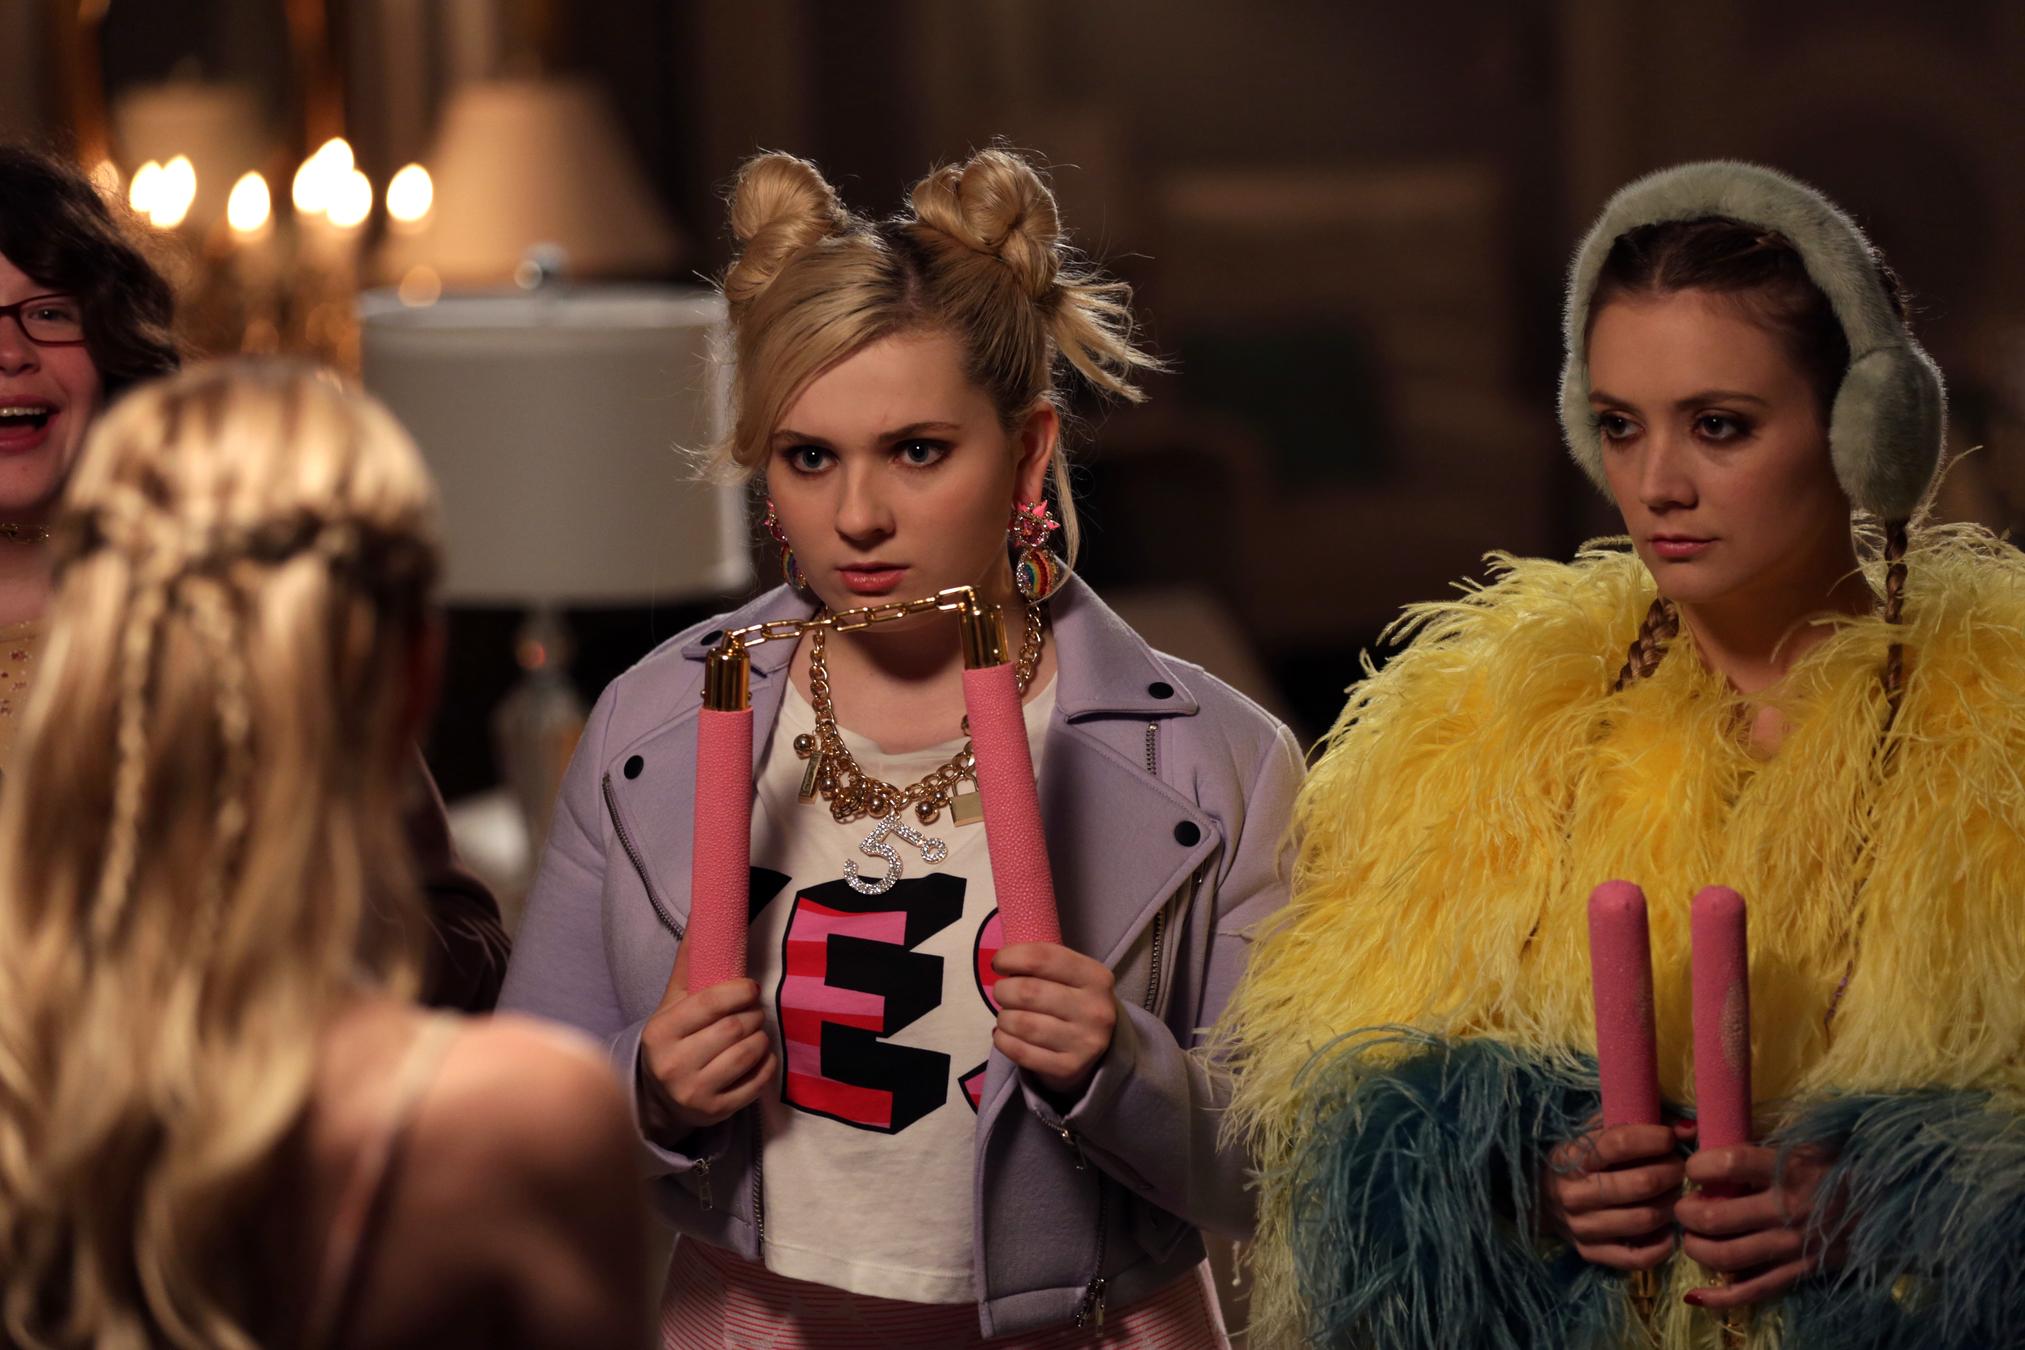 'Scream Queens' Season 2 to Add Four New Cast Members